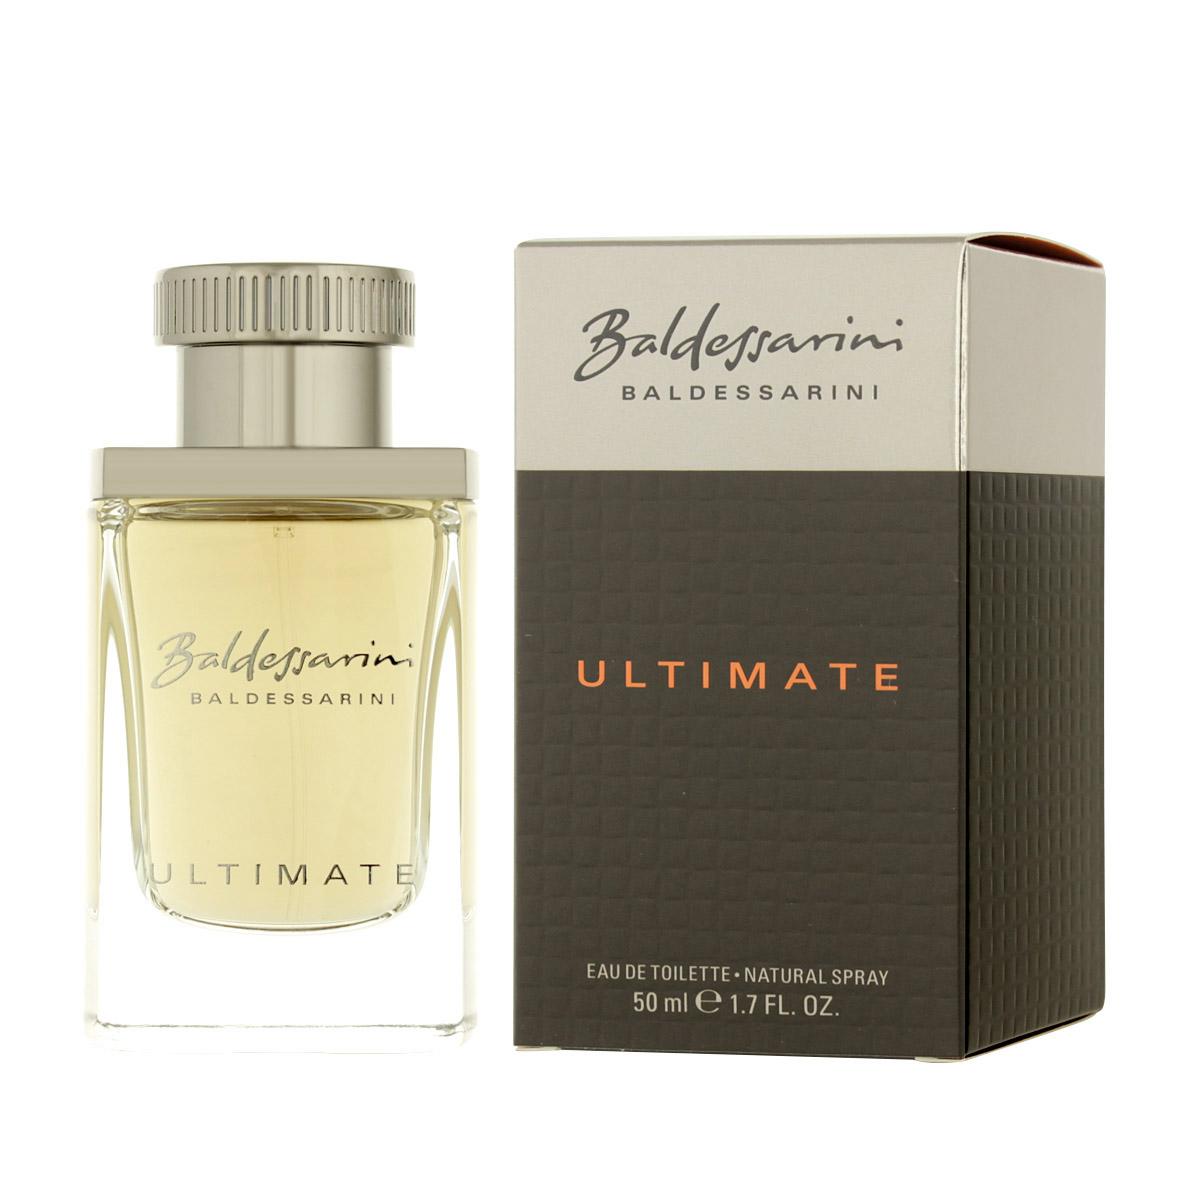 Baldessarini Ultimate Eau De Toilette 50 ml (man)